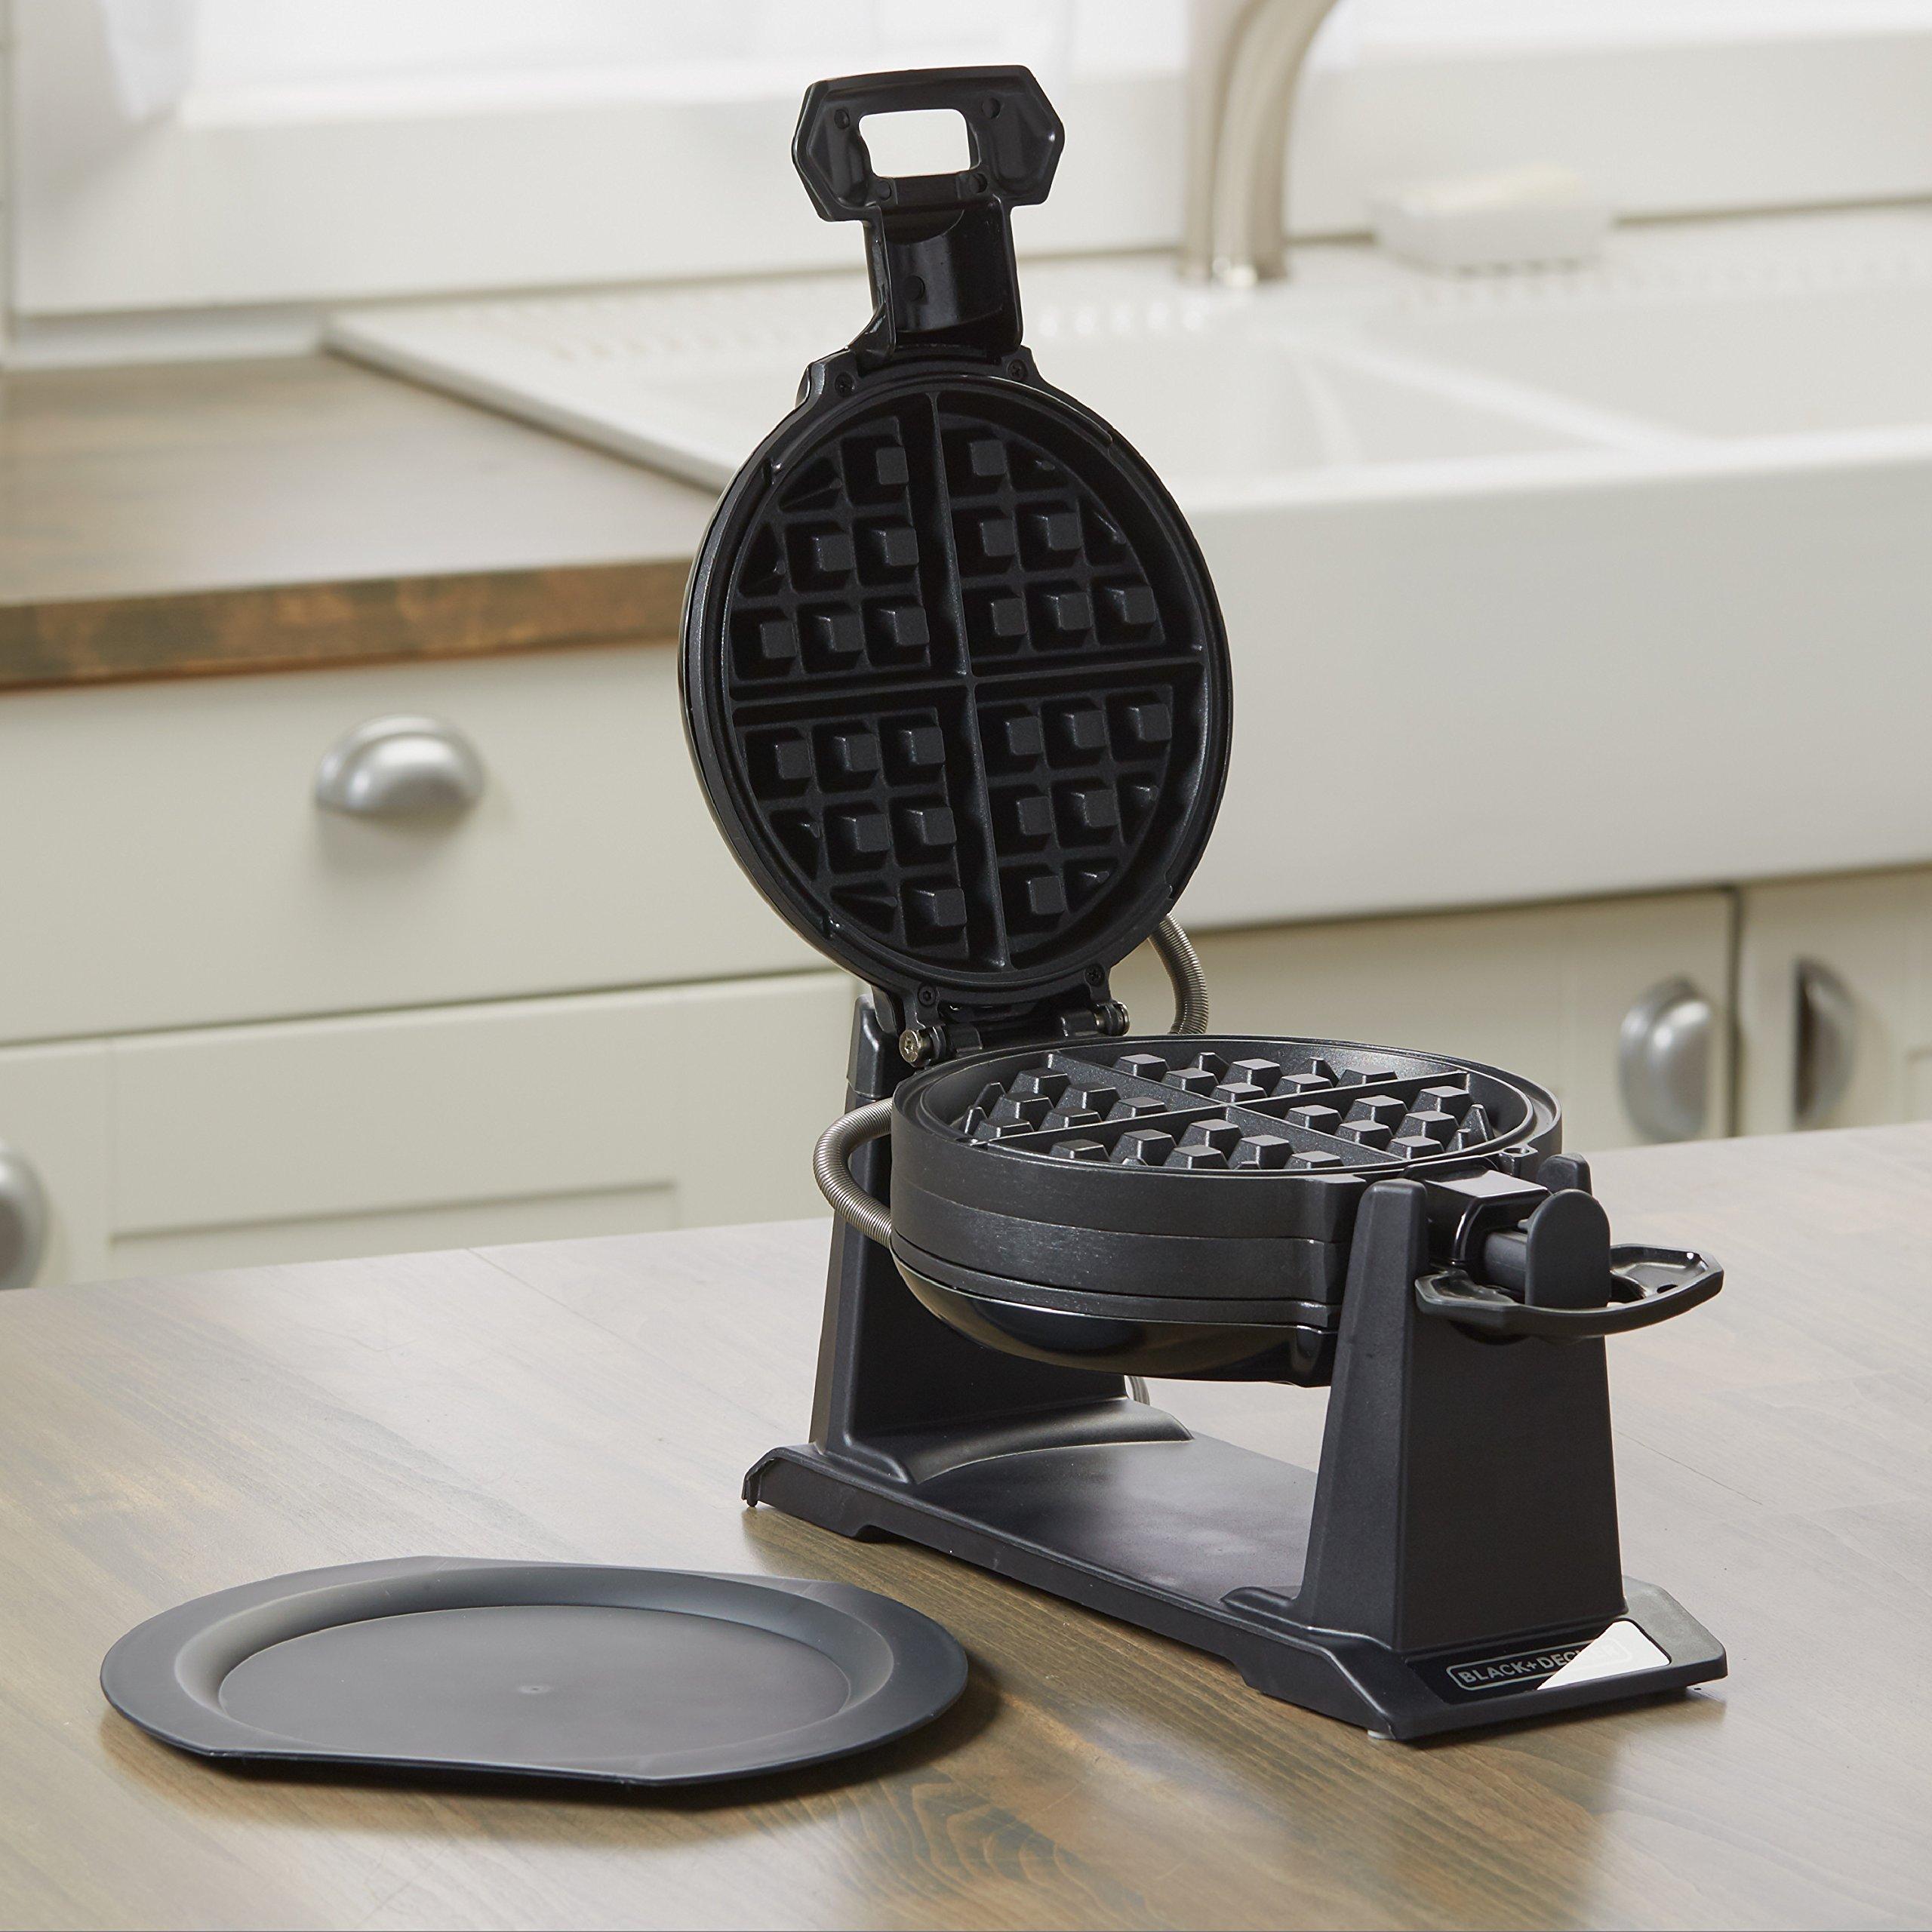 BLACK+DECKER Rotating Waffle Maker, Black, WMD200B by BLACK+DECKER (Image #4)